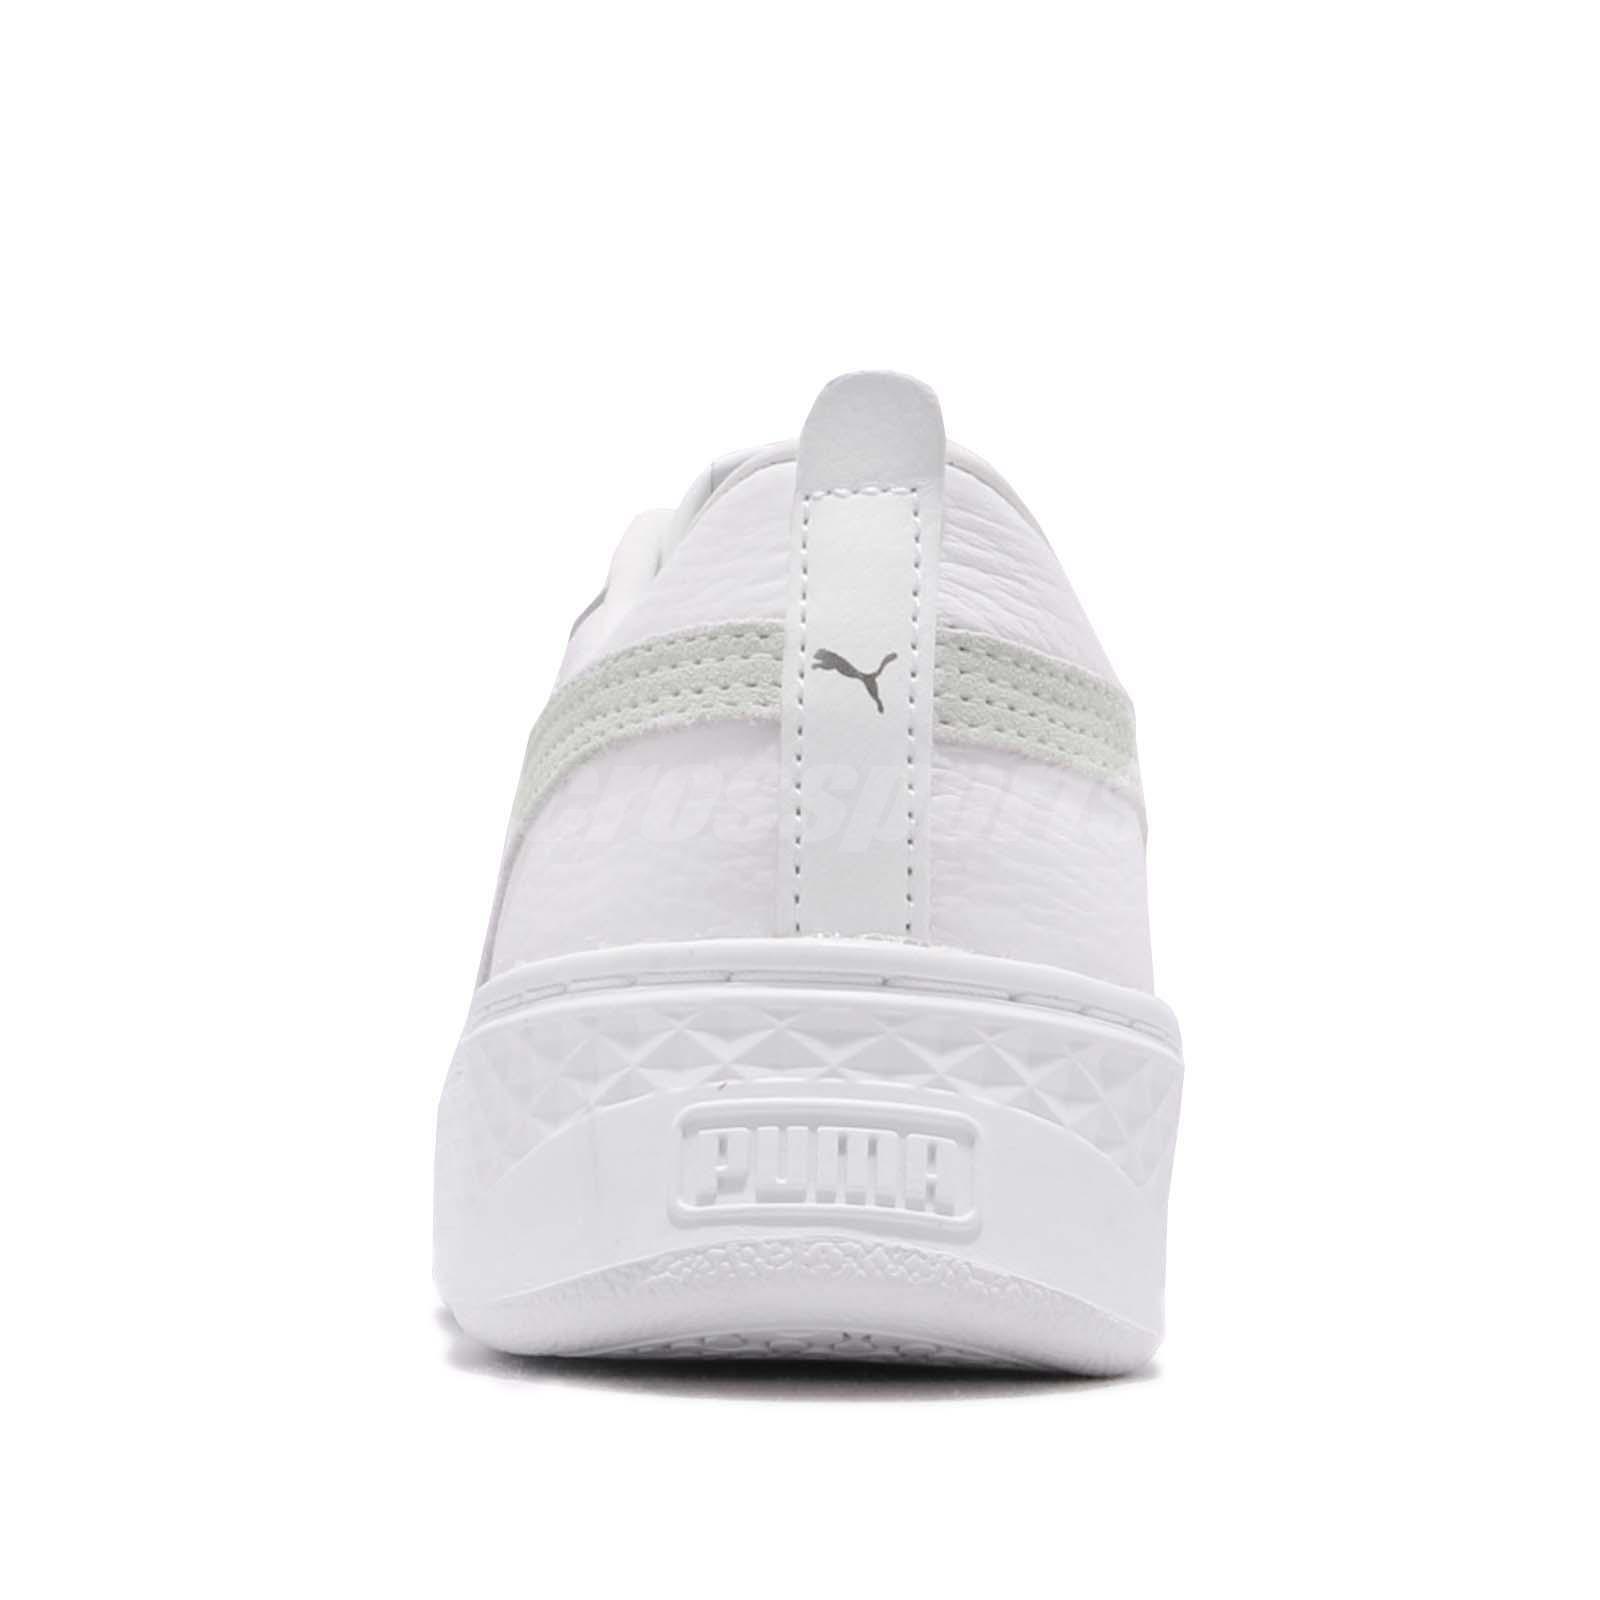 b3289ff6434e Puma Smash Platform L White Women Lifestyle Casual Shoes Sneakers ...